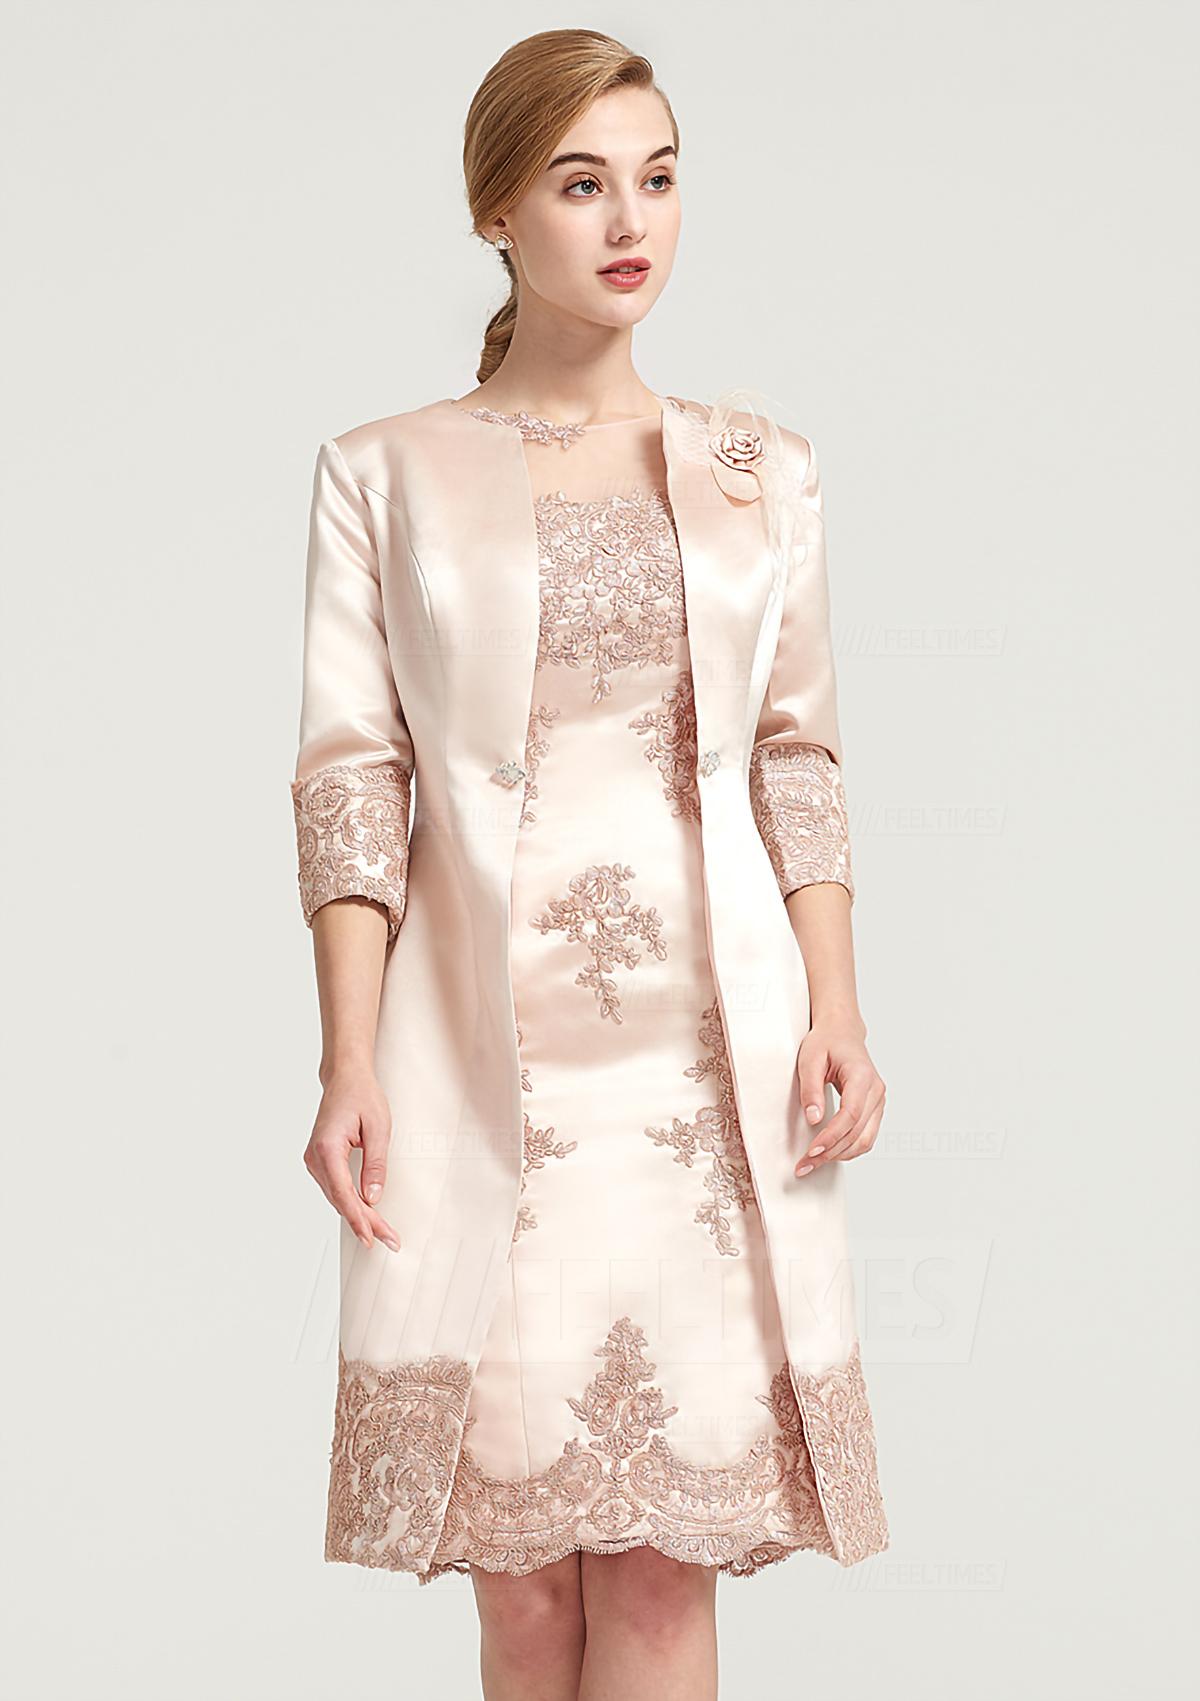 fc2e1e1839b Sheath Column Bateau Sleeveless Knee-Length Satin Mother of the Bride Dress  With Shoulder Flower Appliqued - Mother of the Bride Dresses S18007M - at  ...